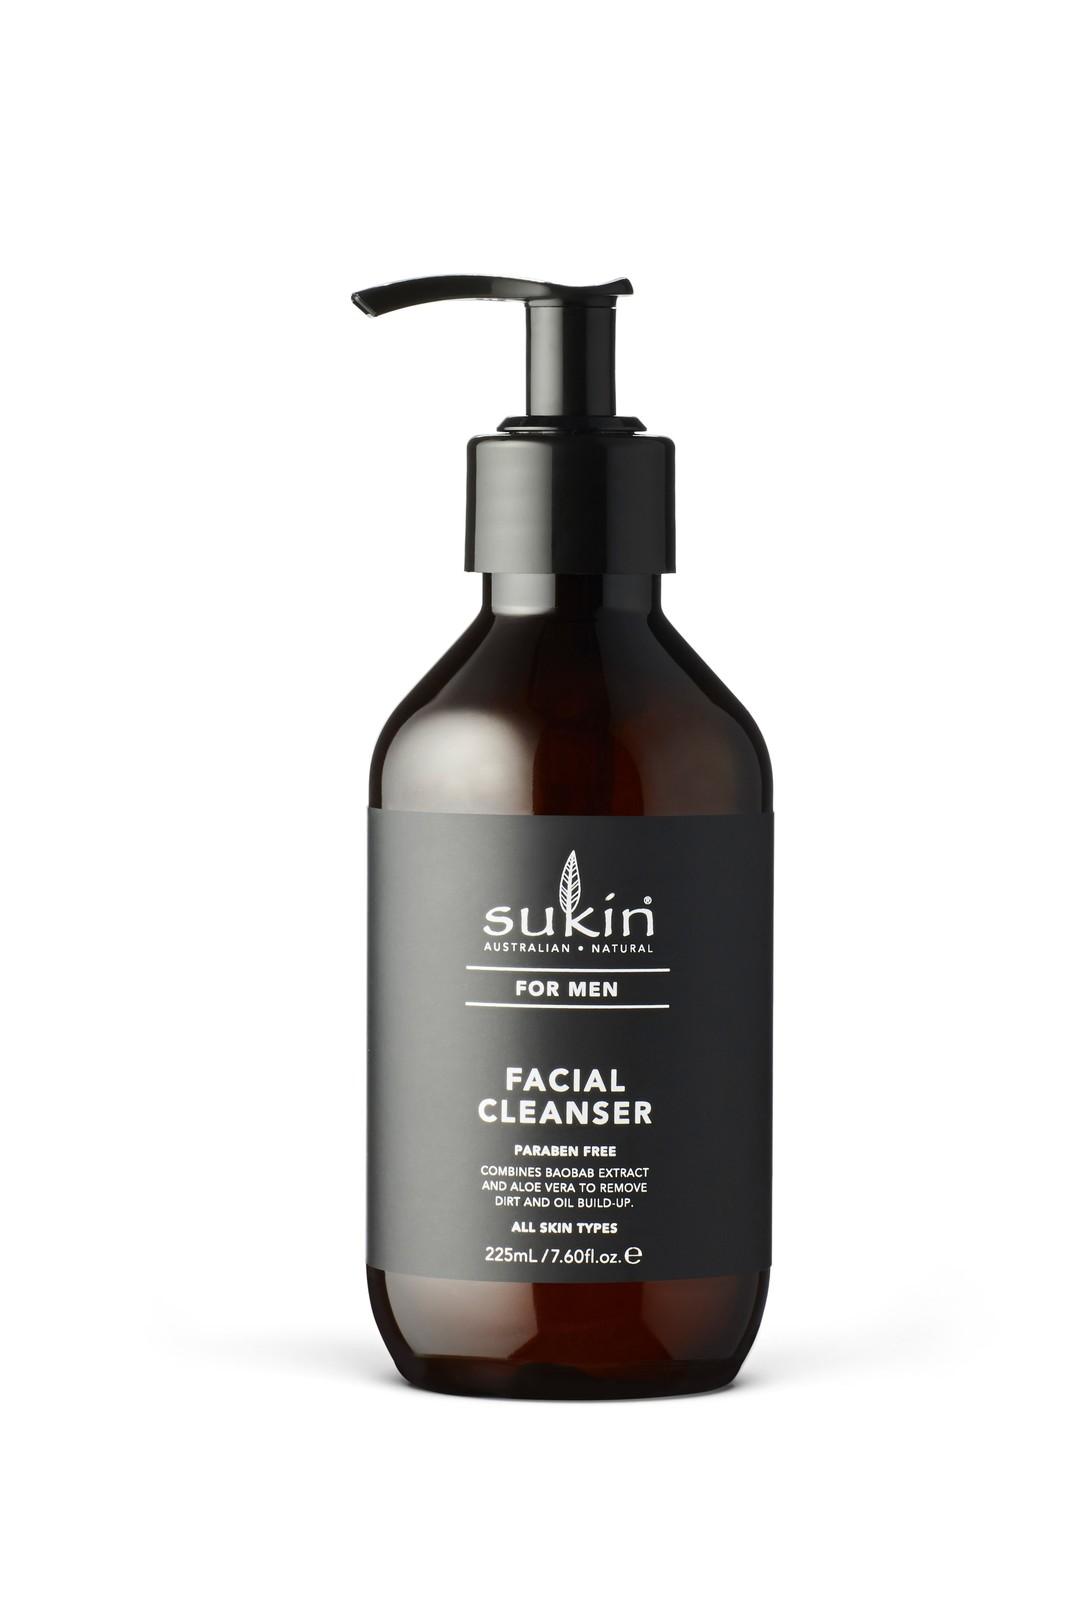 Sukin for Men Facial Cleanser (225ml) image